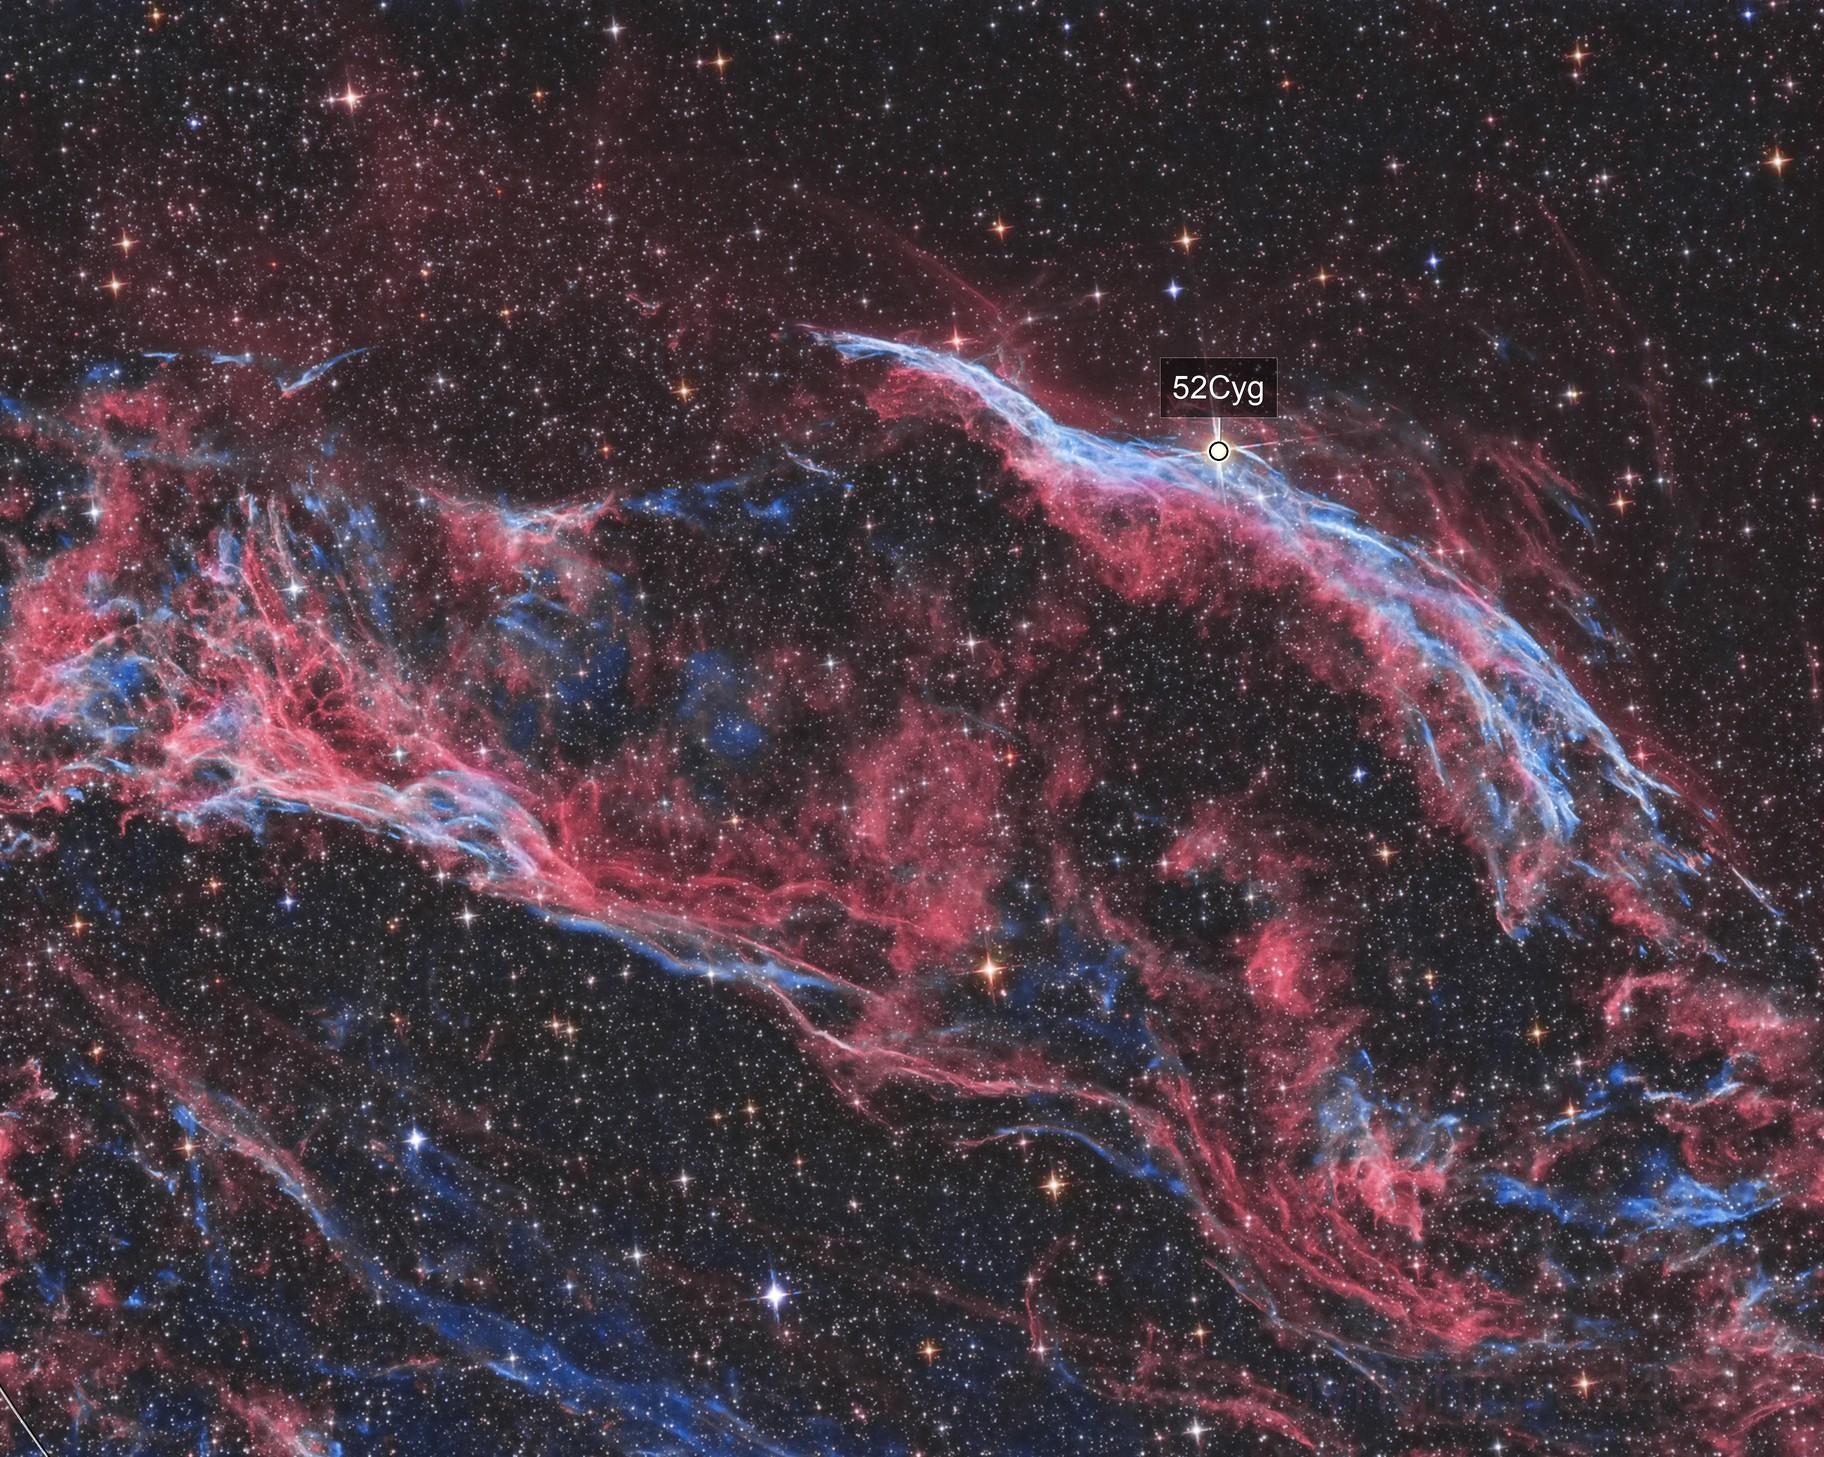 NGC 6960 HOO process